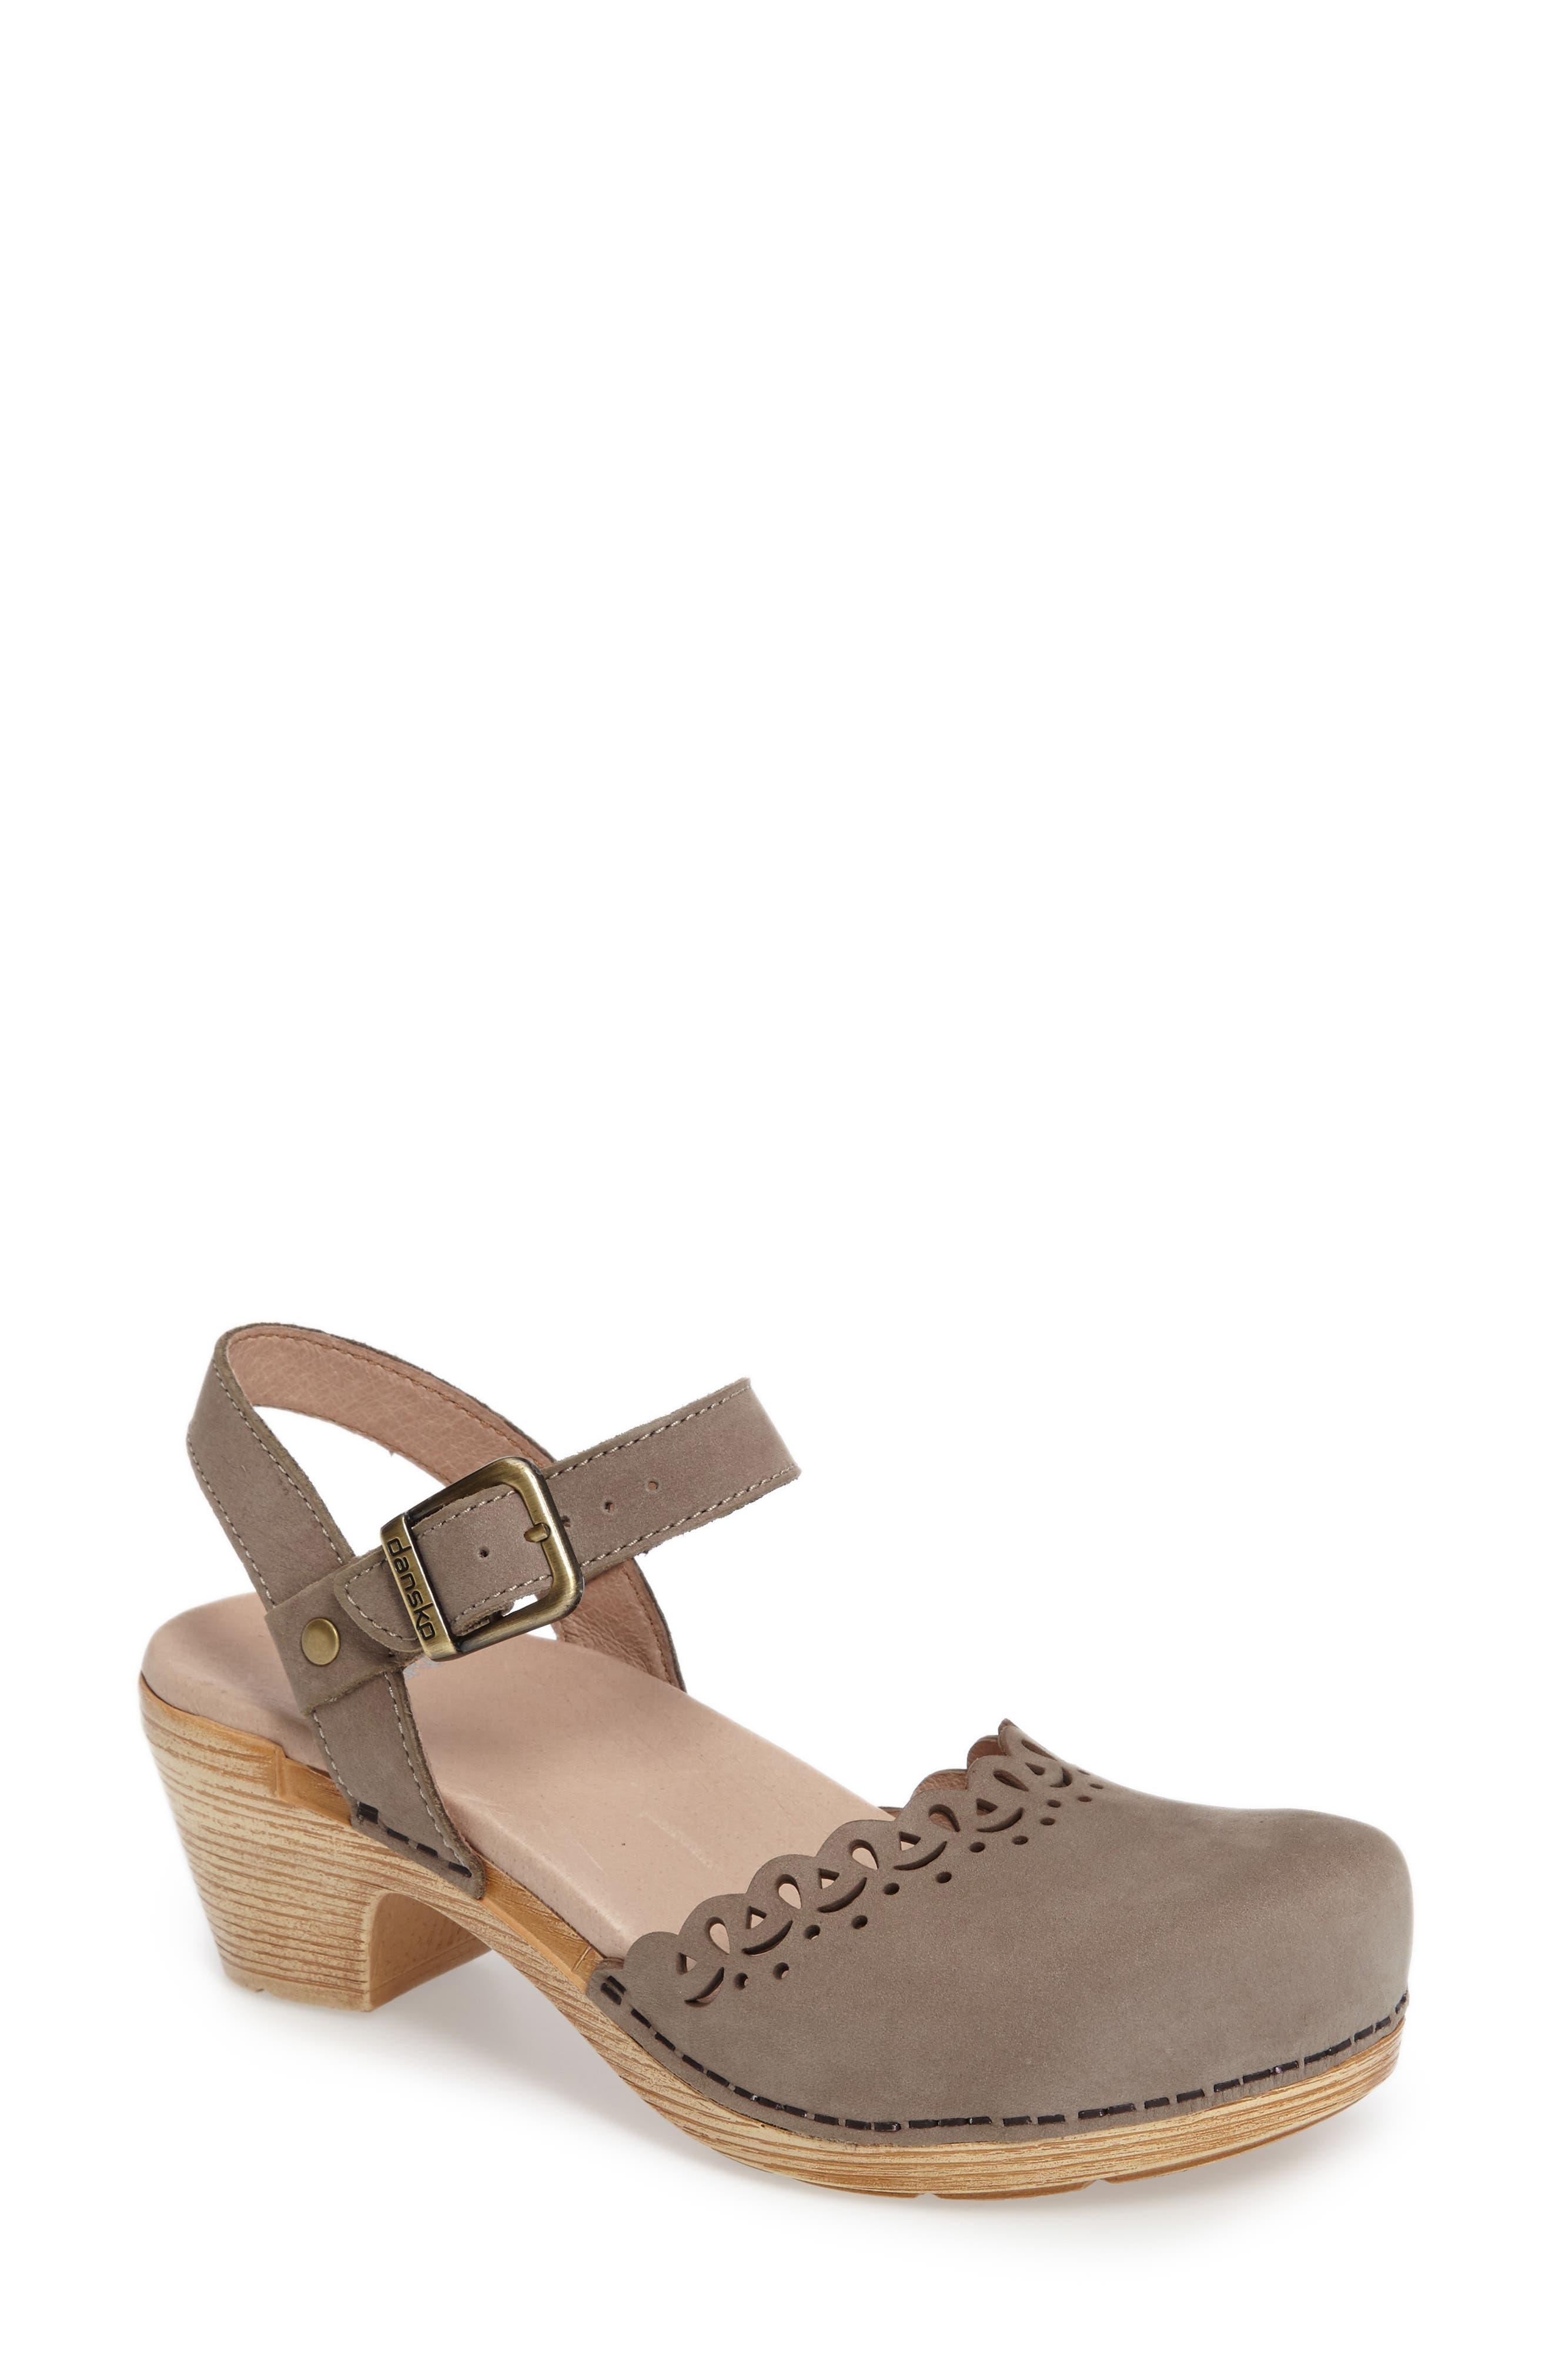 Main Image - Dansko 'Marta' Ankle Strap Clog (Women)